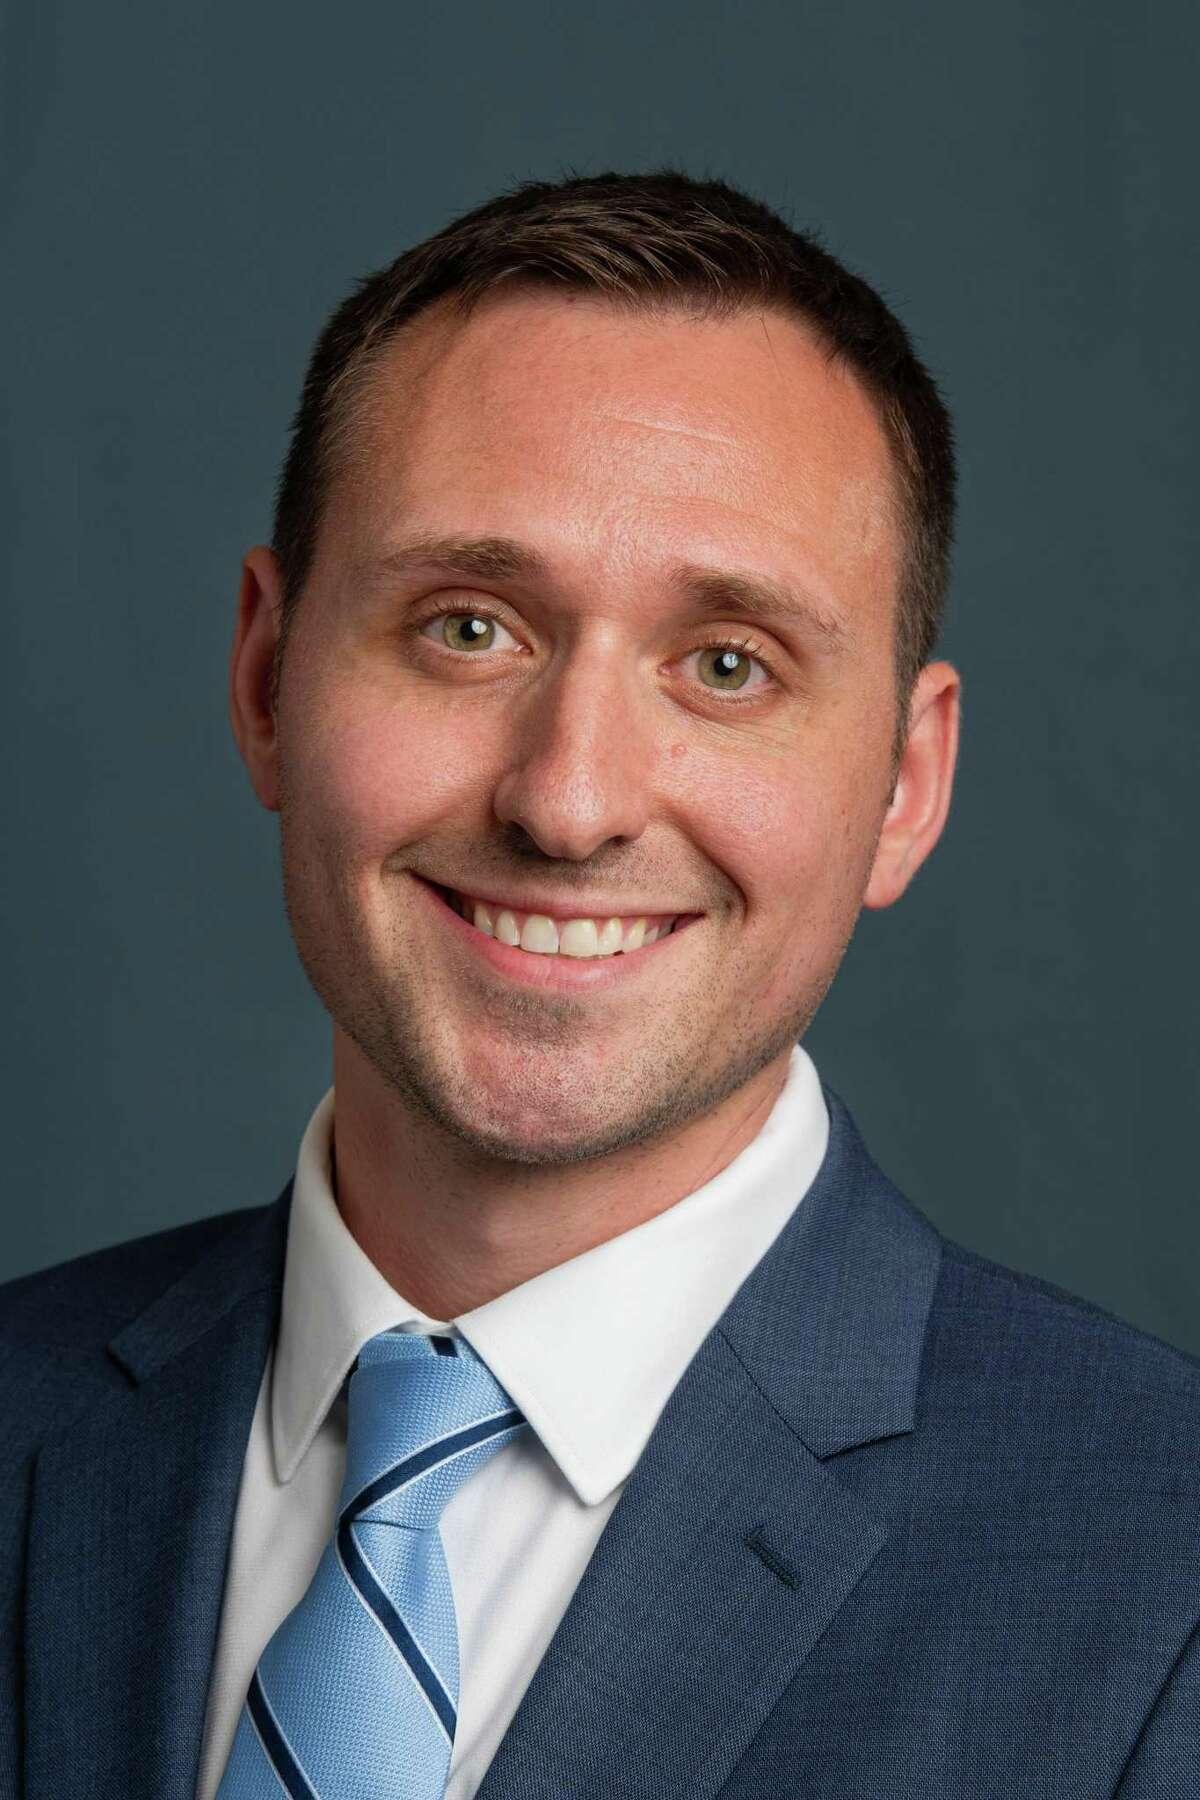 Chris Bandecchi